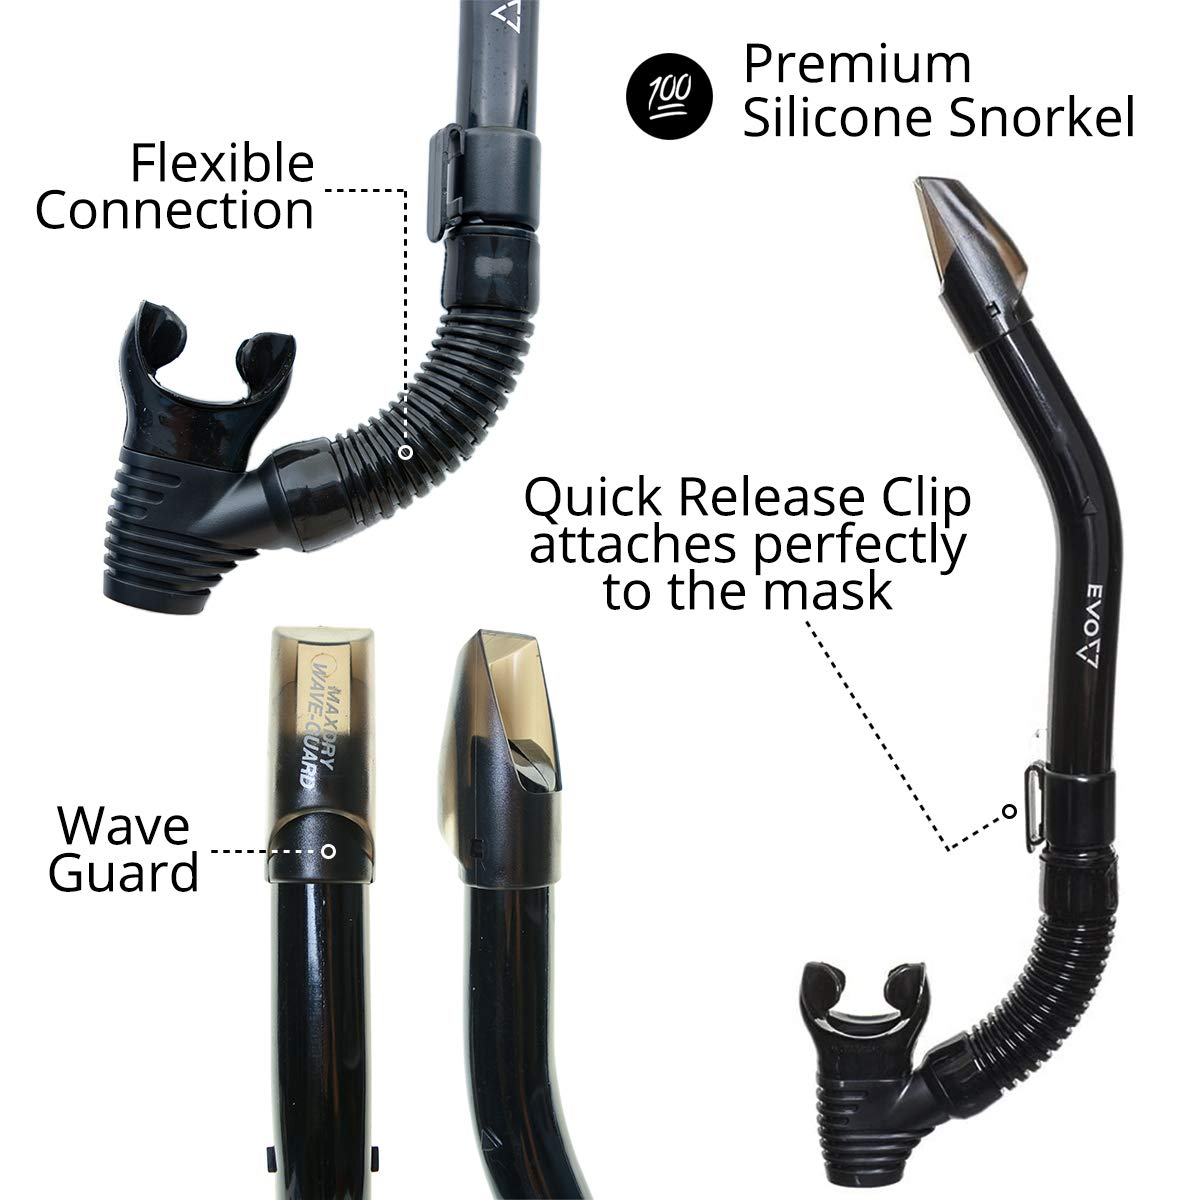 EVO Hi Definition Snorkel Combo - Single Lens Snorkel Infographic